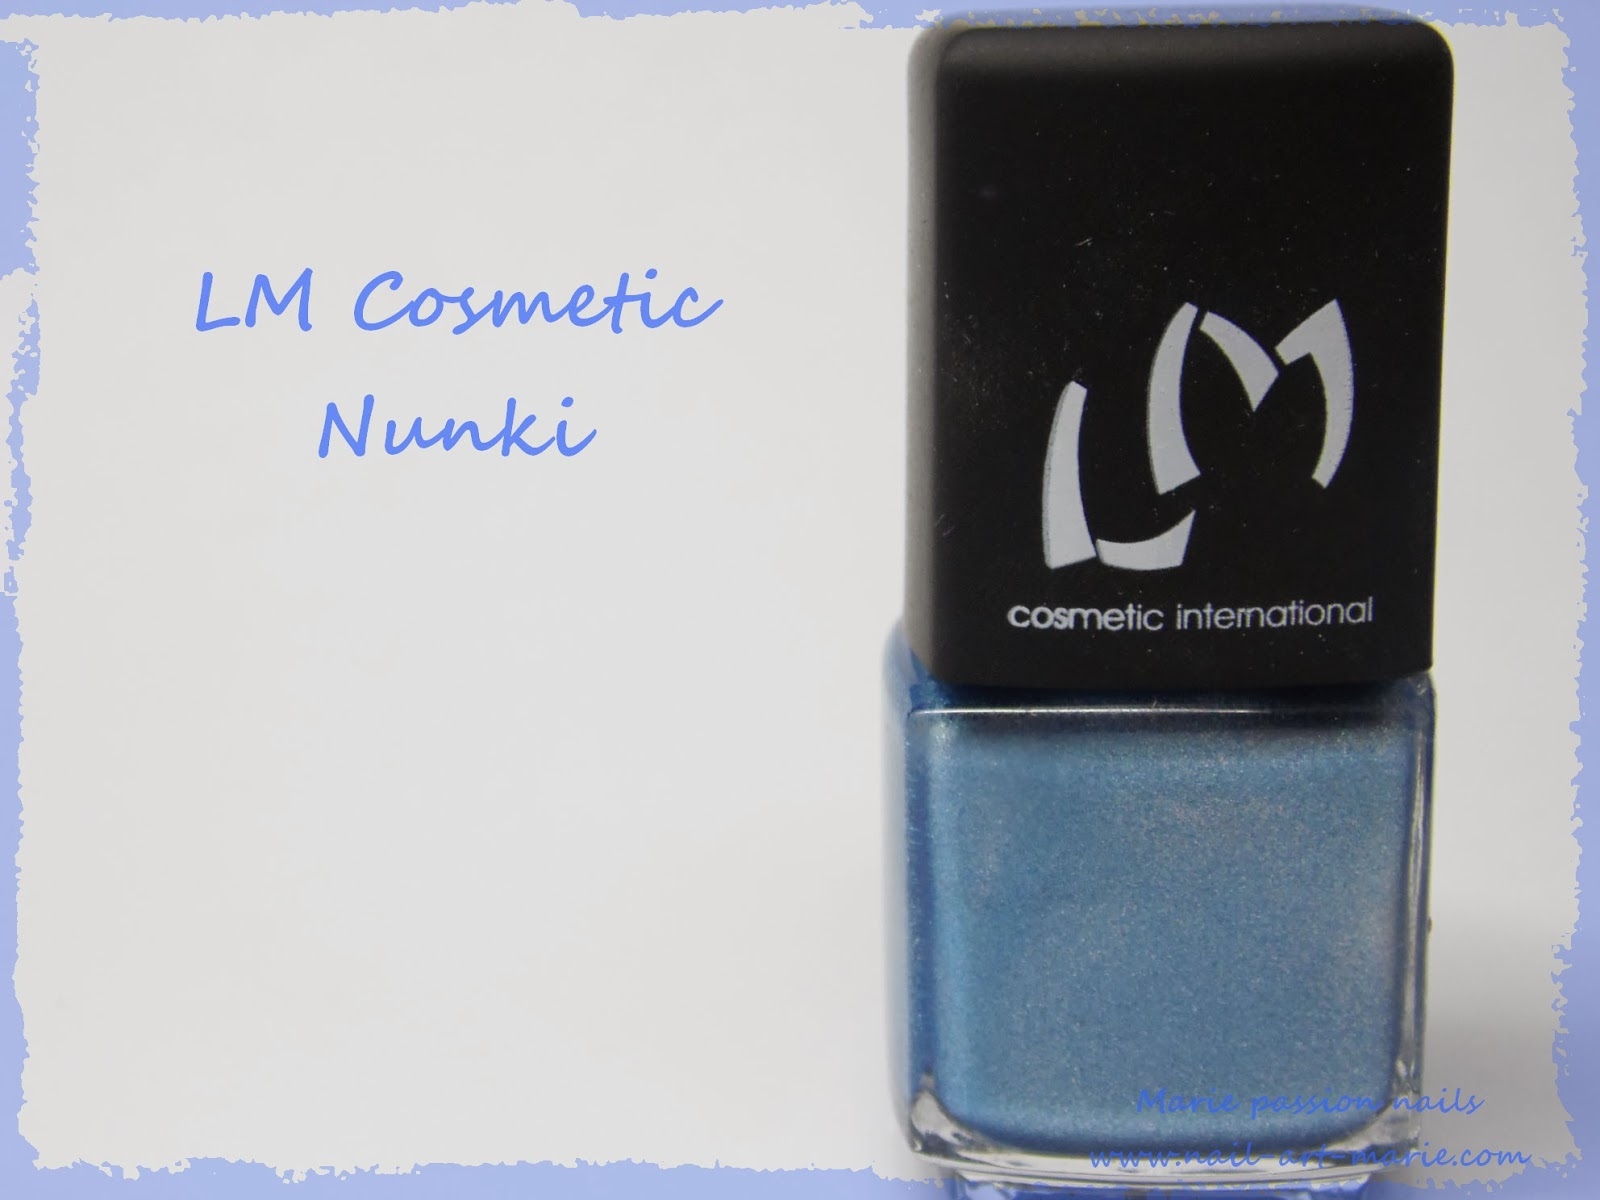 LM Cosmetic Nunki1